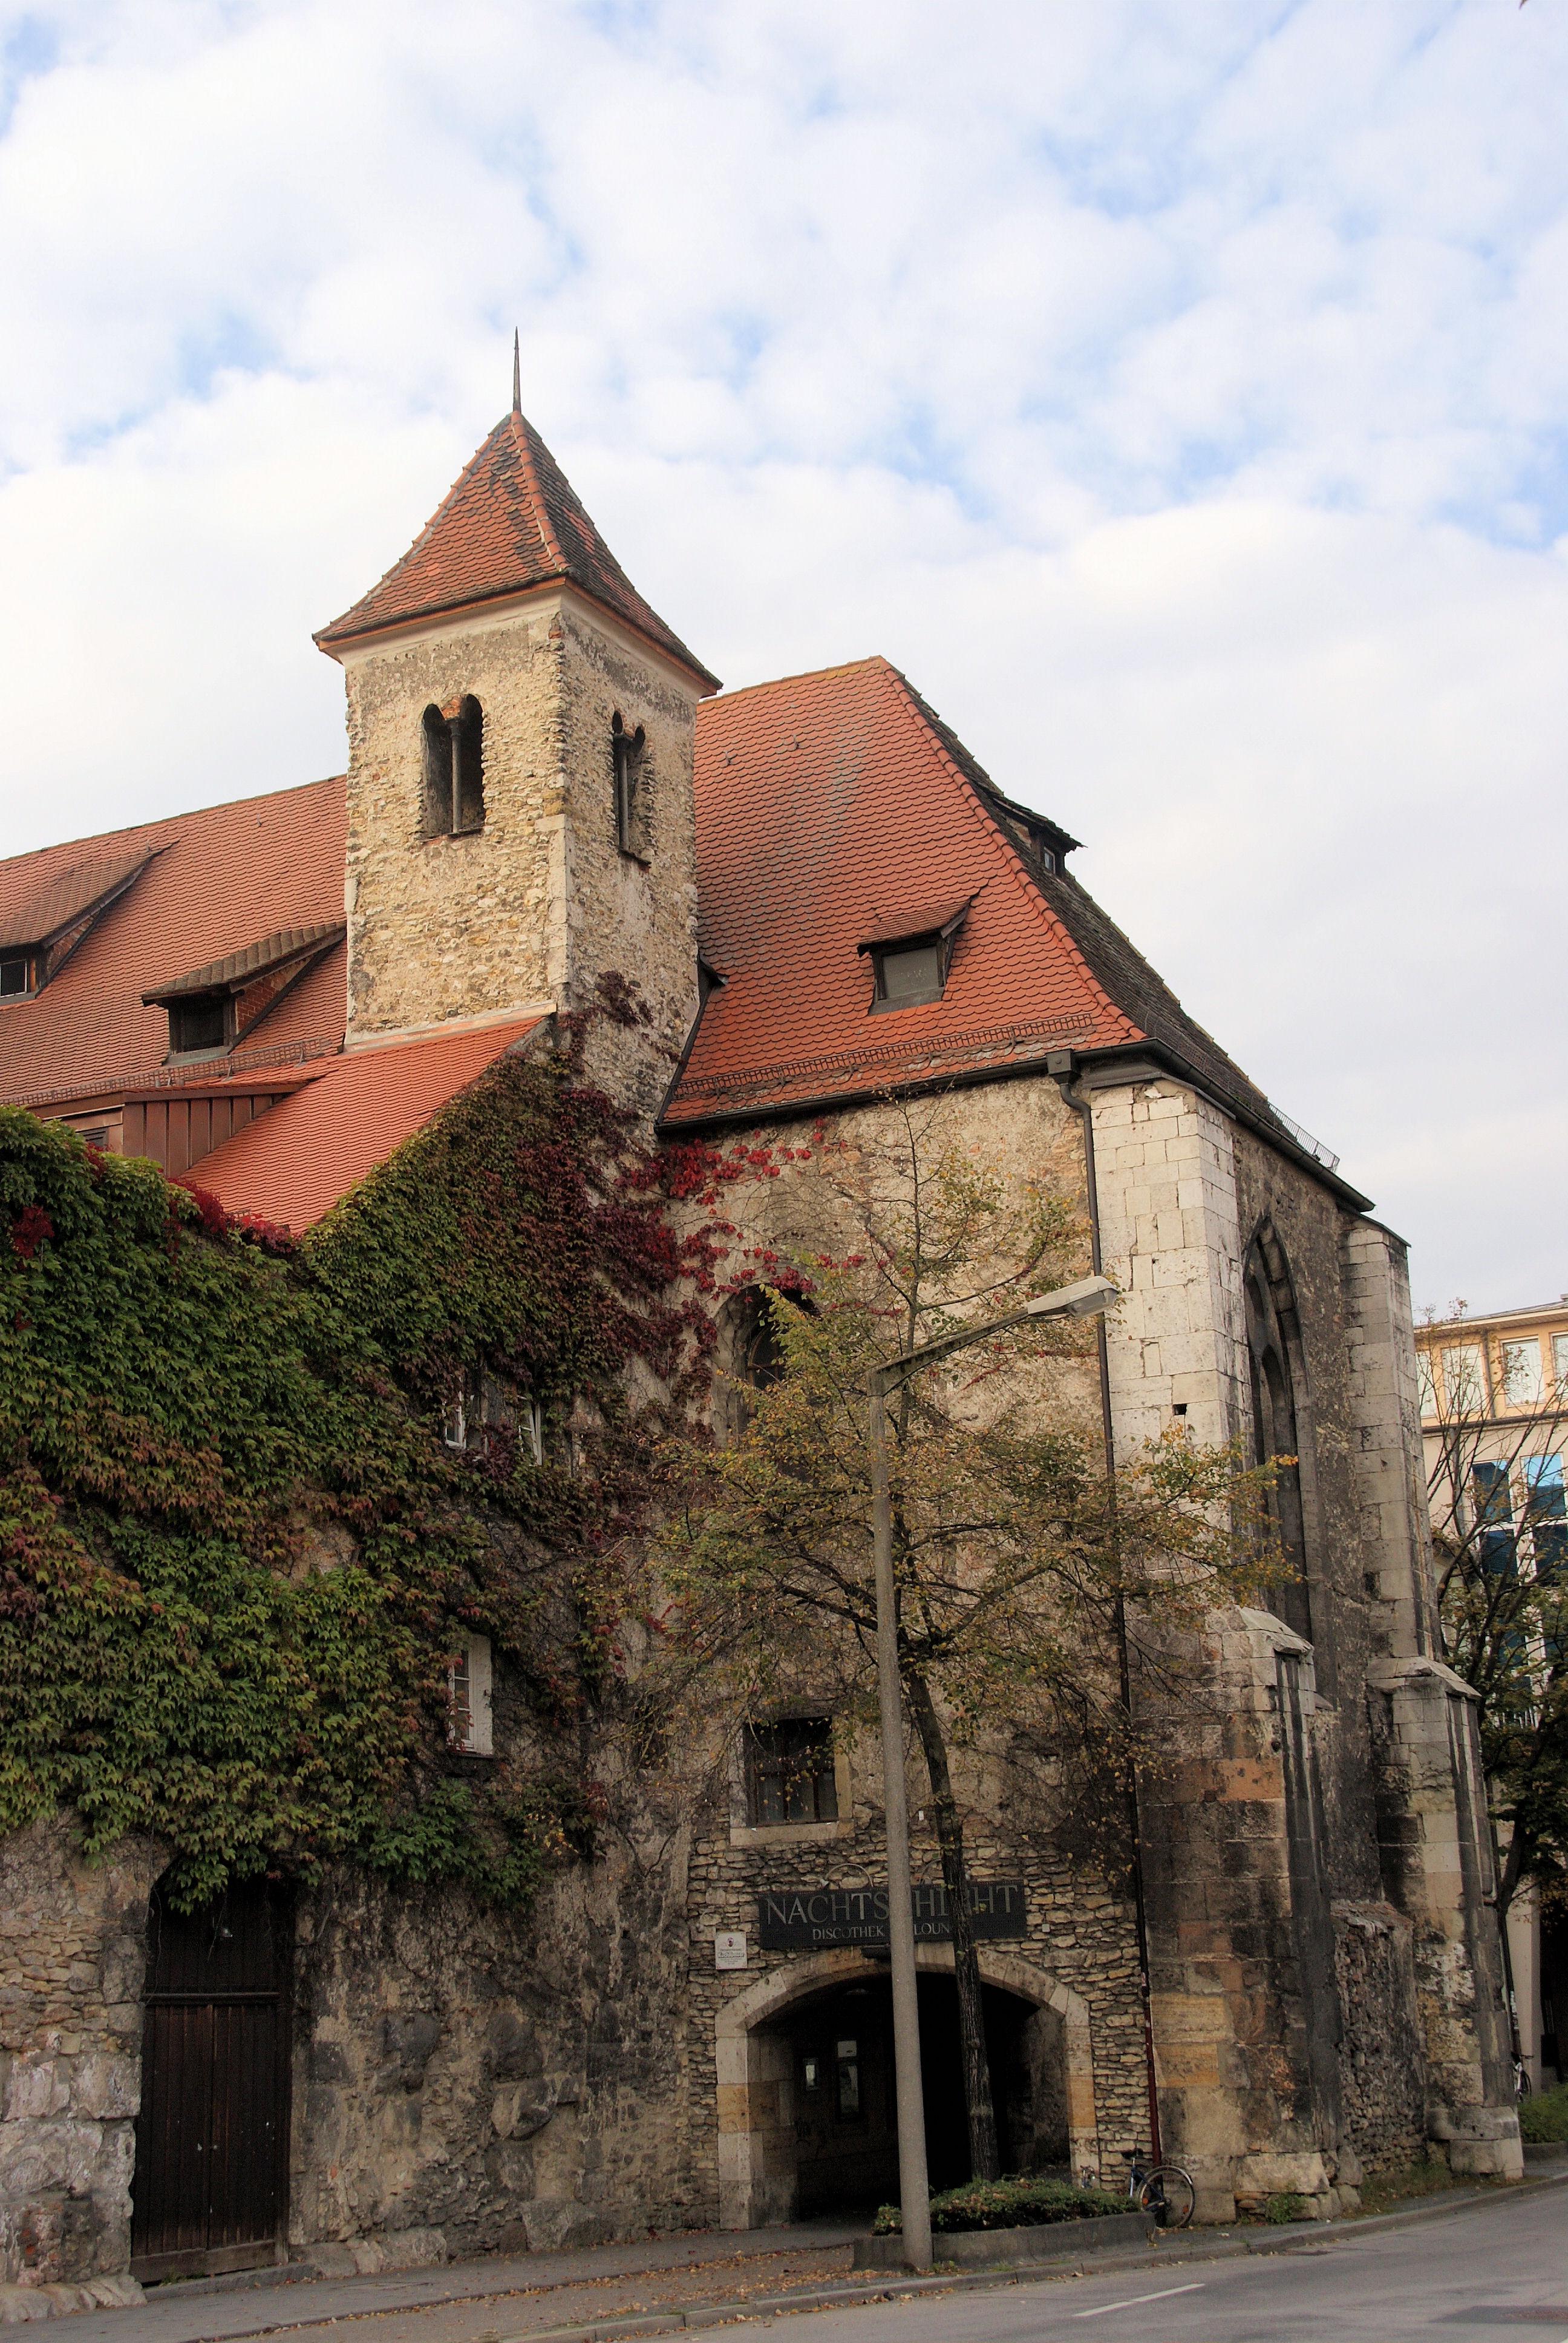 Peter Und Paul Regensburg